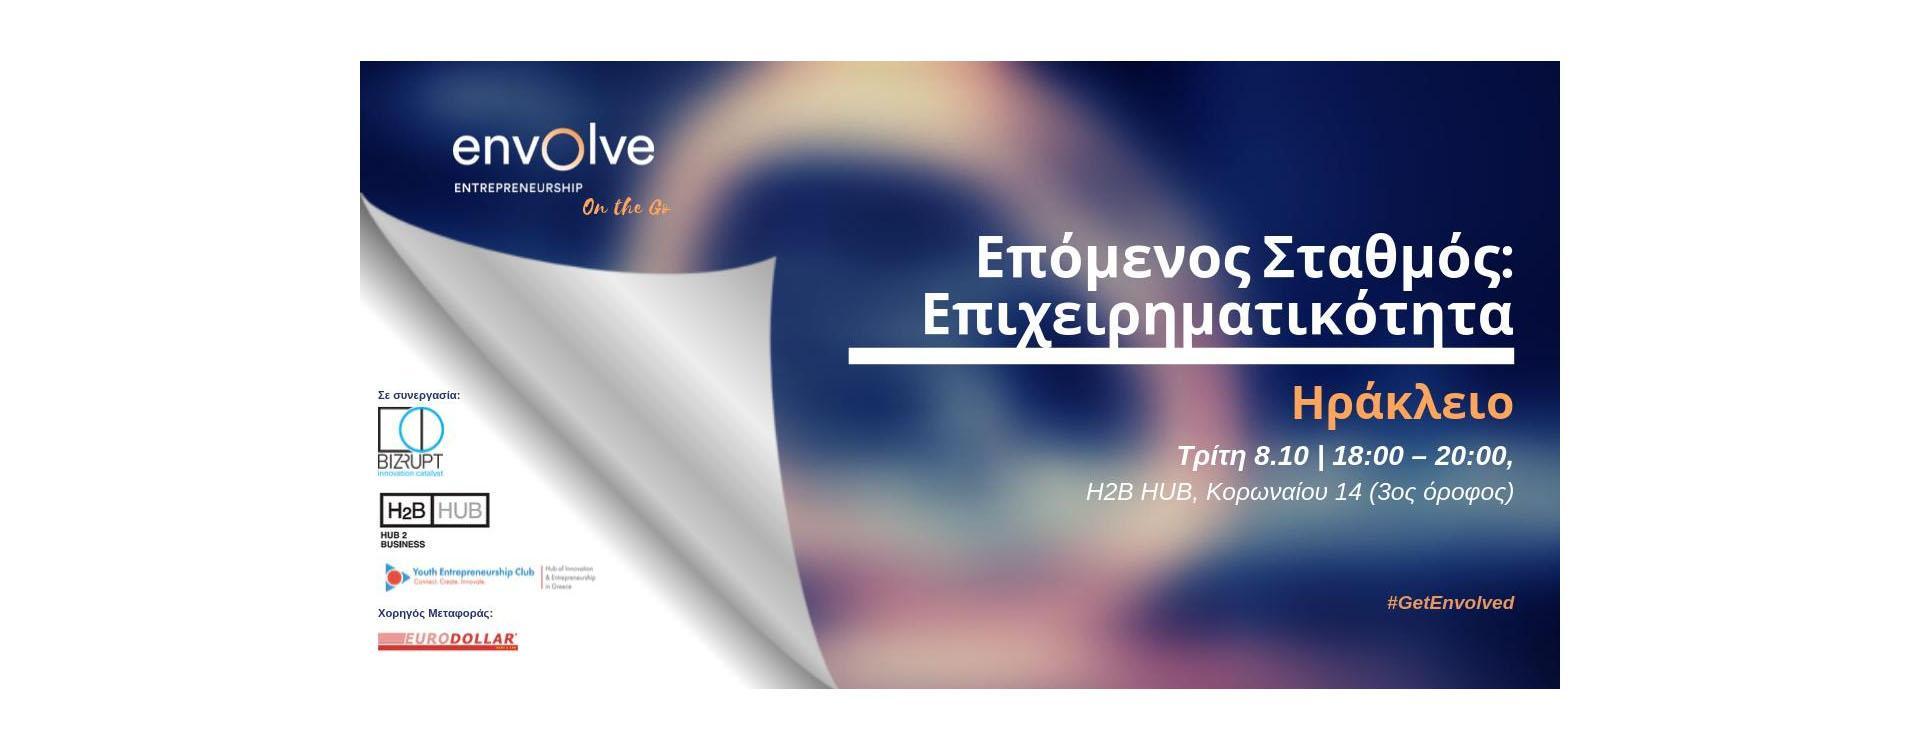 Envolve Award Greece - Επιχειρηματικότητα | Ηράκλειο 2019